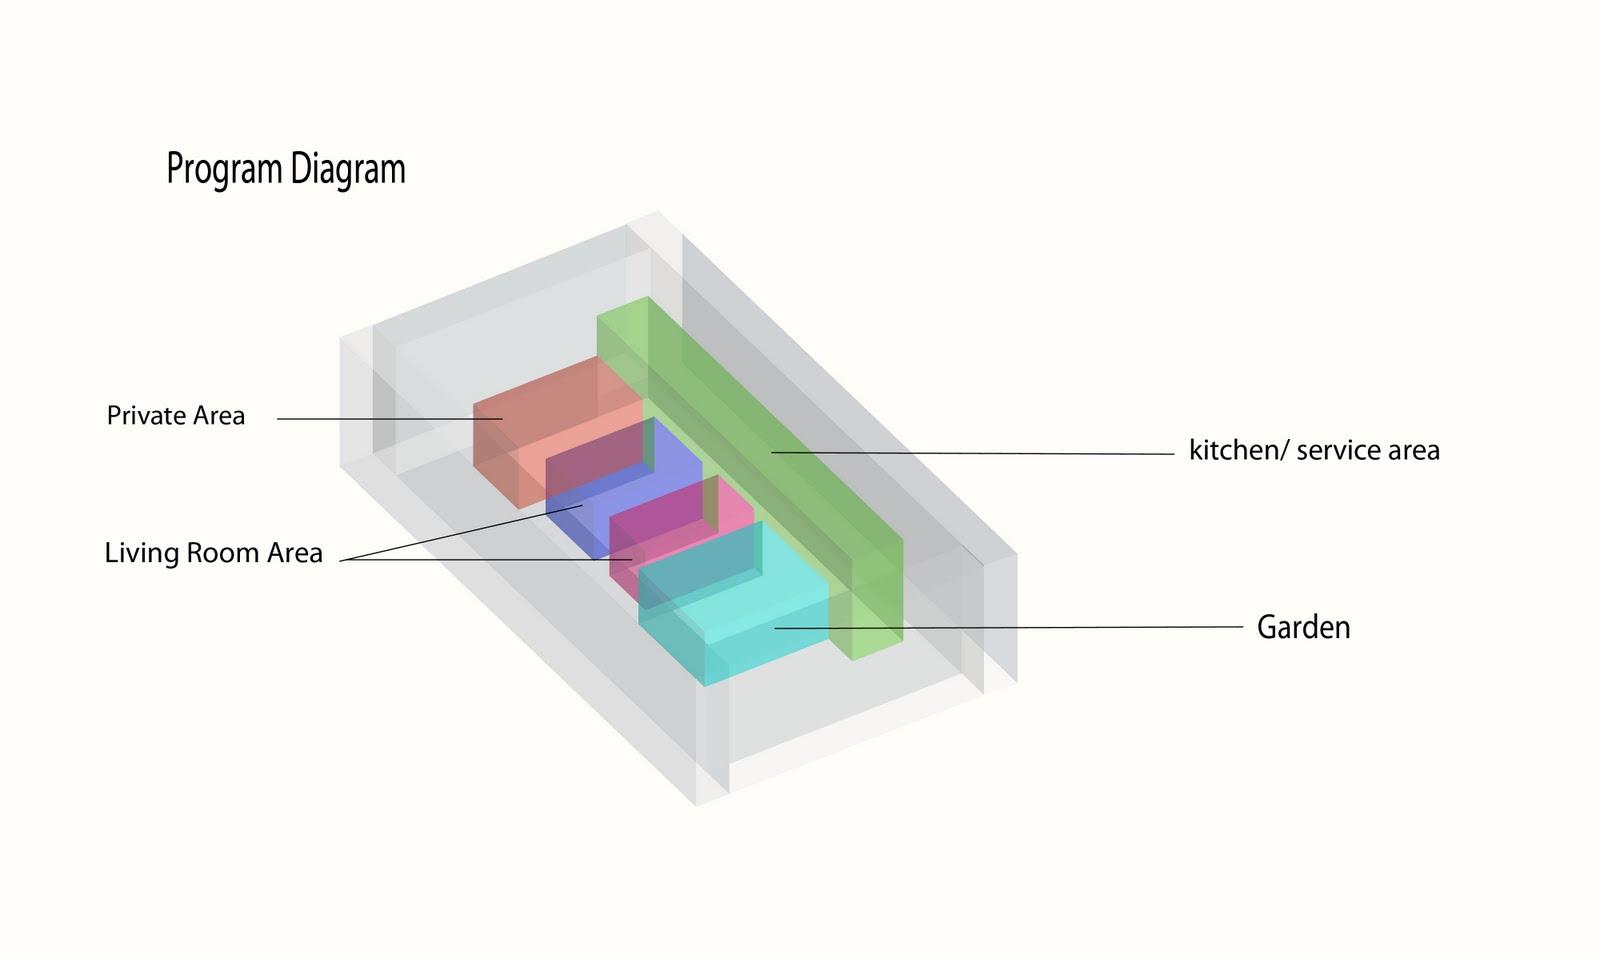 ARC 4058 Fall 2011: Alejandra Barrera, House N Diagrams